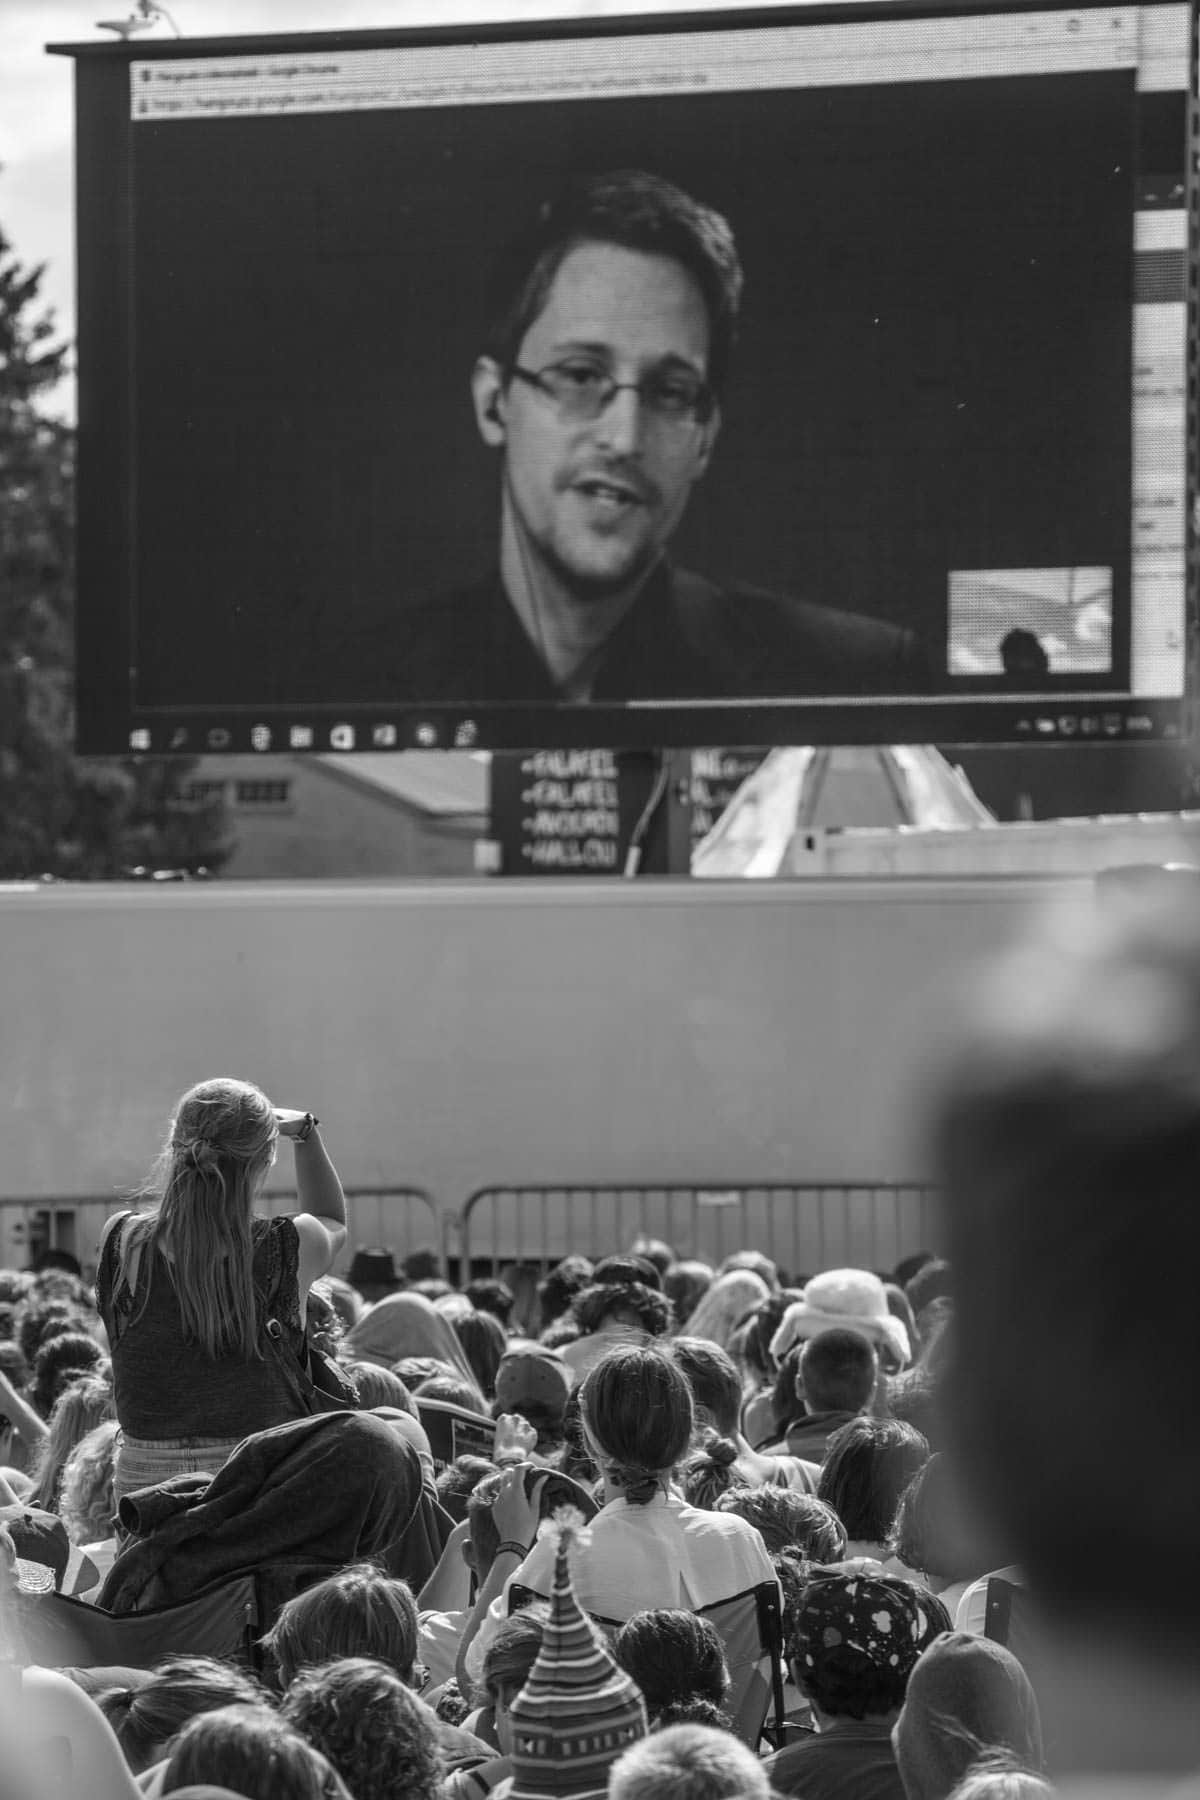 Edward Snowden taler via en netforbindelse på Roskilde Festival.